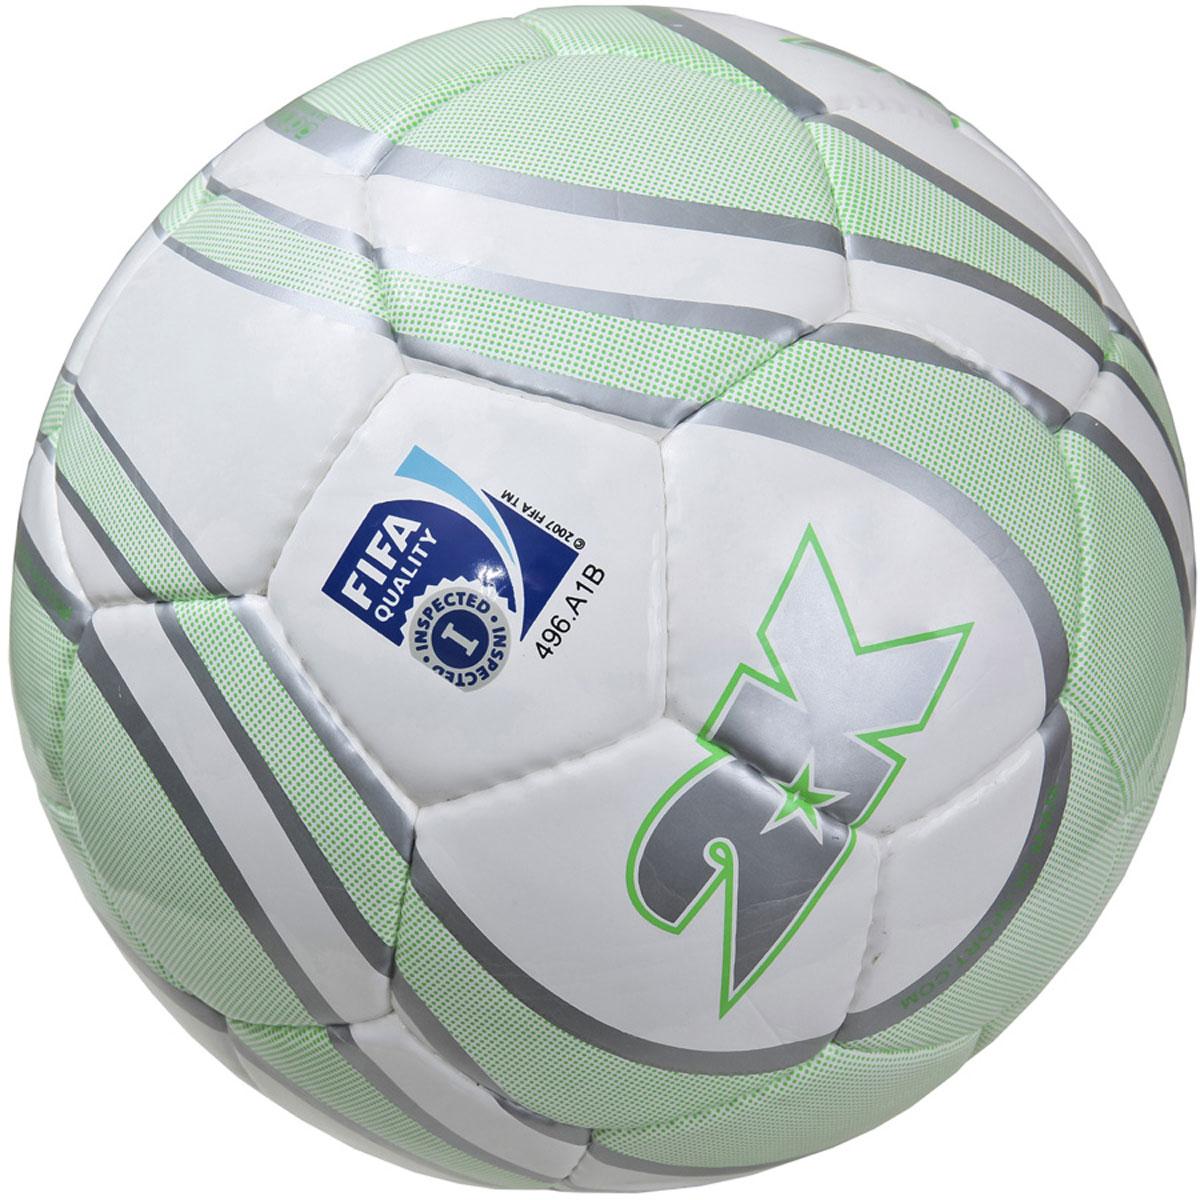 Мяч футбольный 2K Sport Parity, цвет: белый, серый, зеленый. 127082F. Размер 5